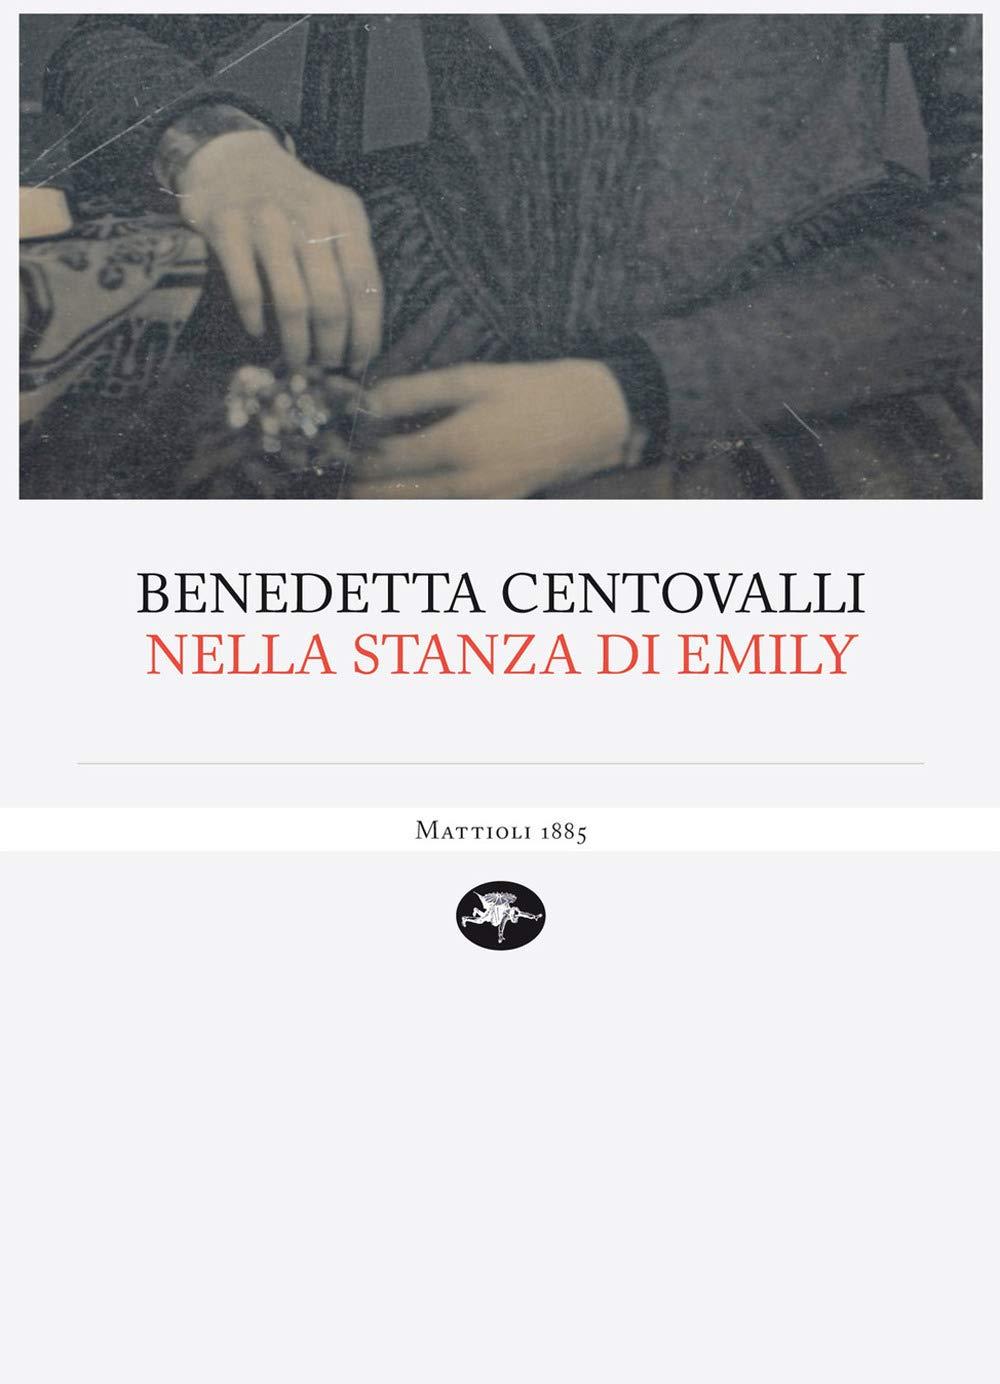 Benedetta Centovalli